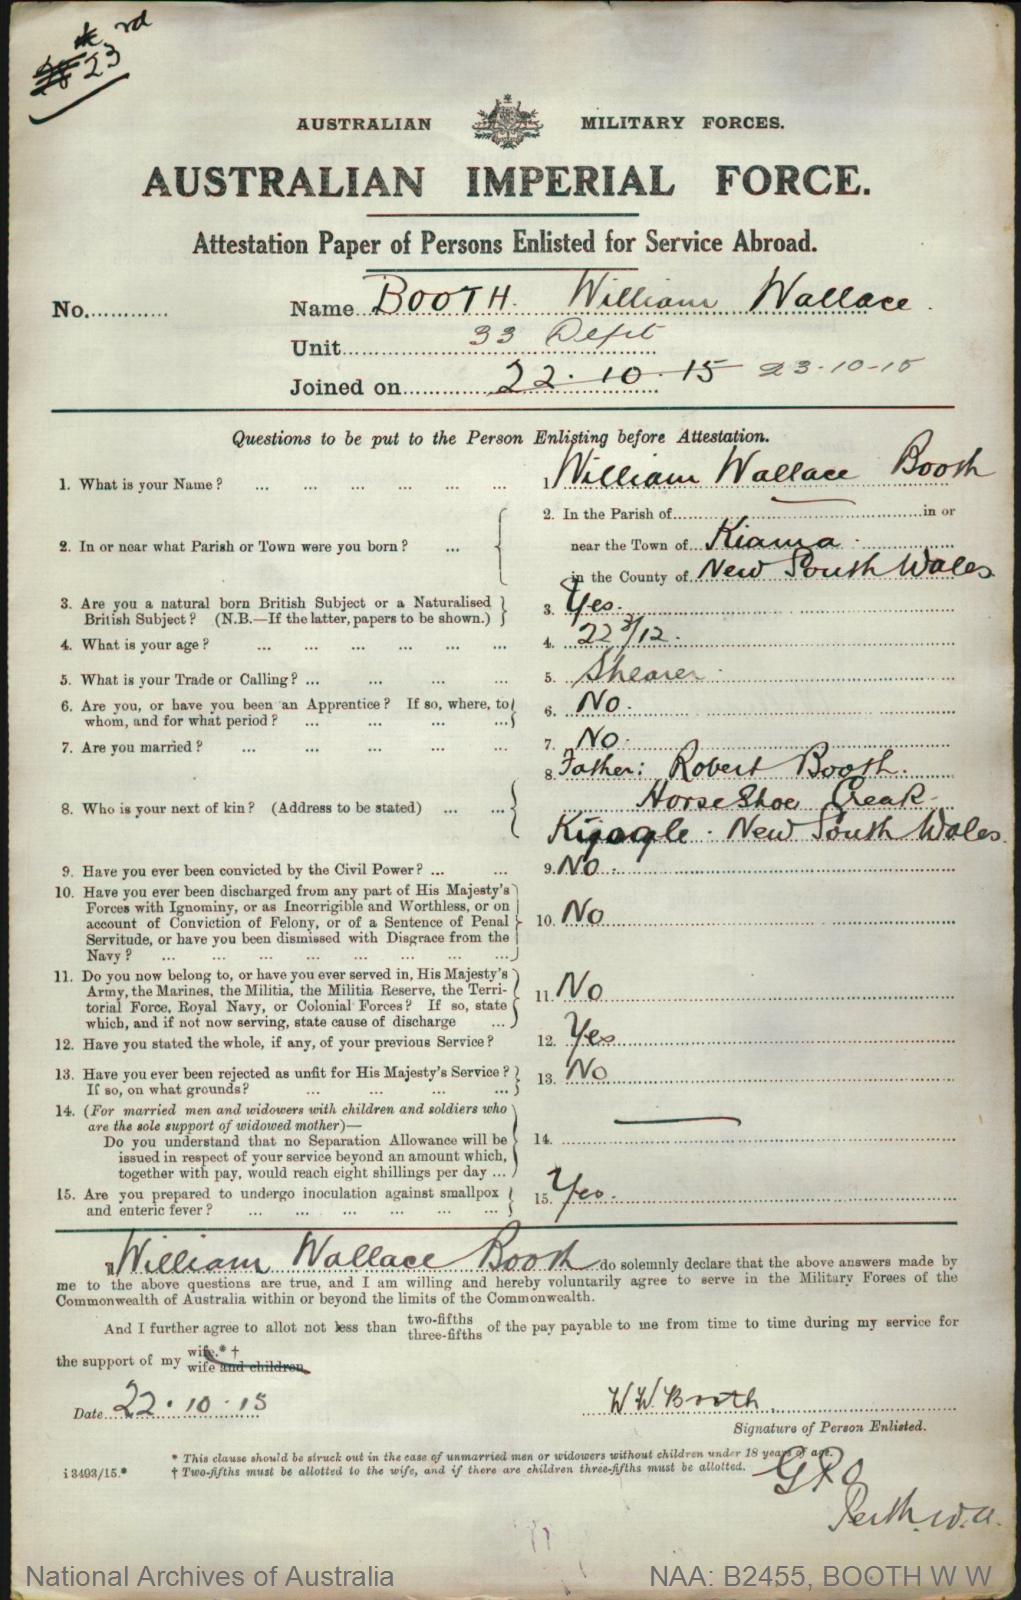 Booth William Wallace : SERN DEPOT : POB Kiama NSW : POE Perth WA : NOK F Booth Robert